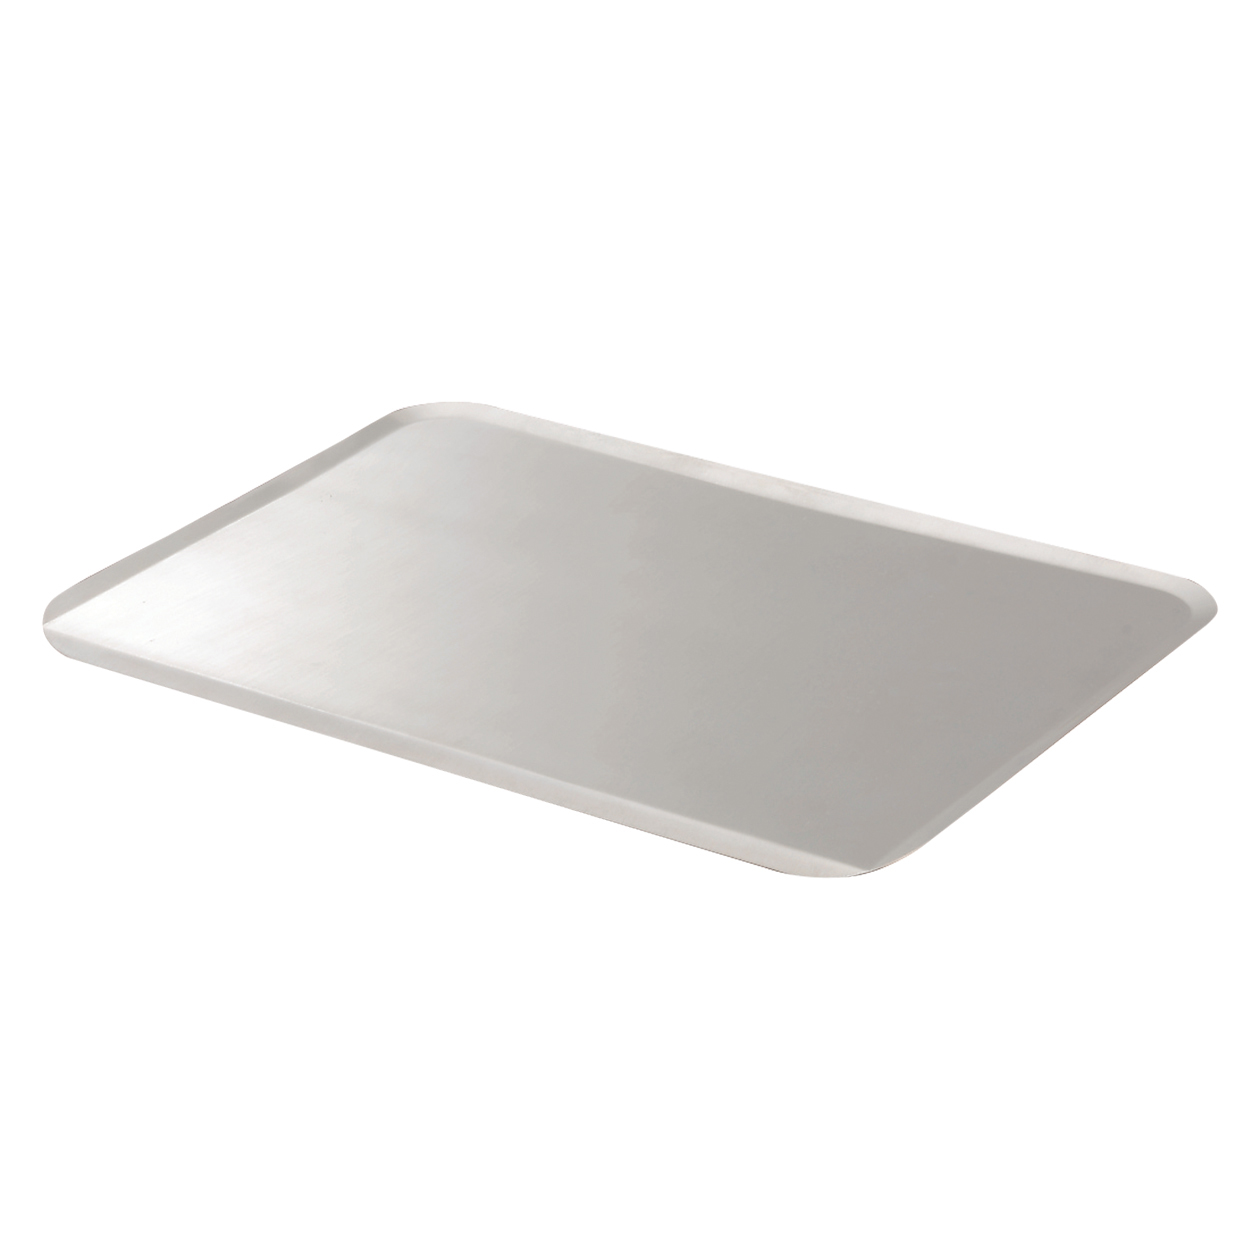 RoomClip商品情報 - ステンレス水切り用傾斜トレー